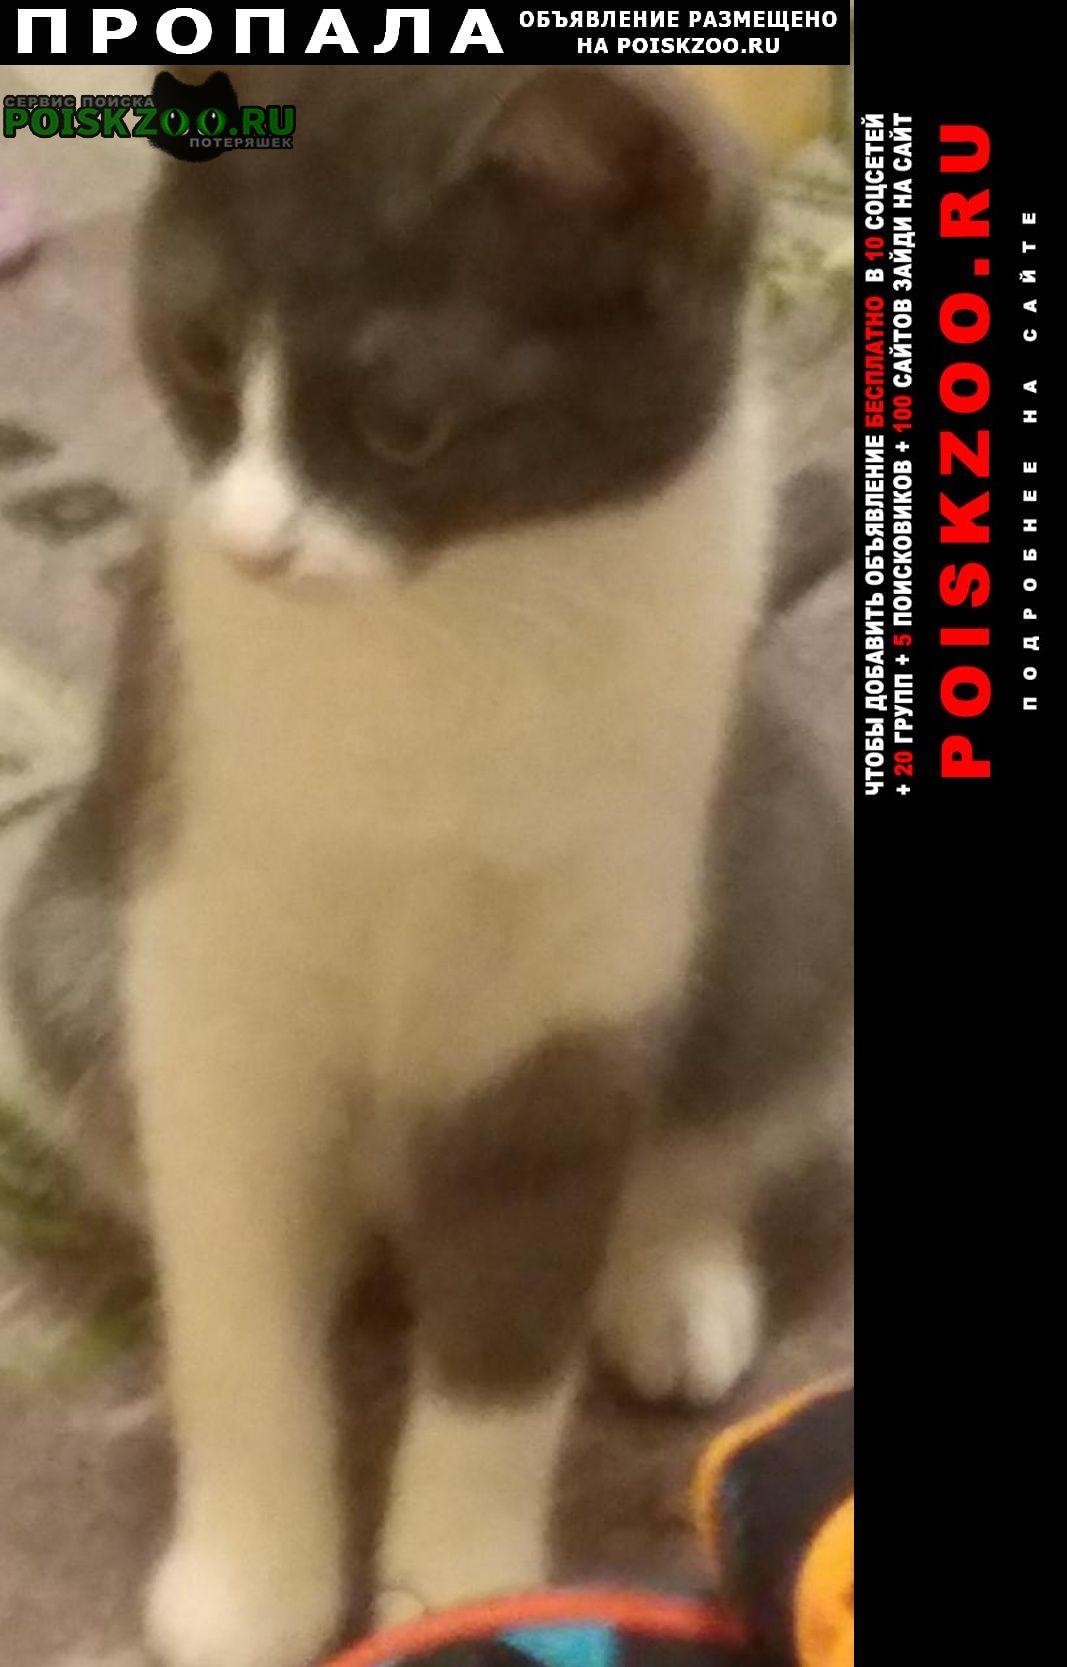 Пропала кошка Коломна